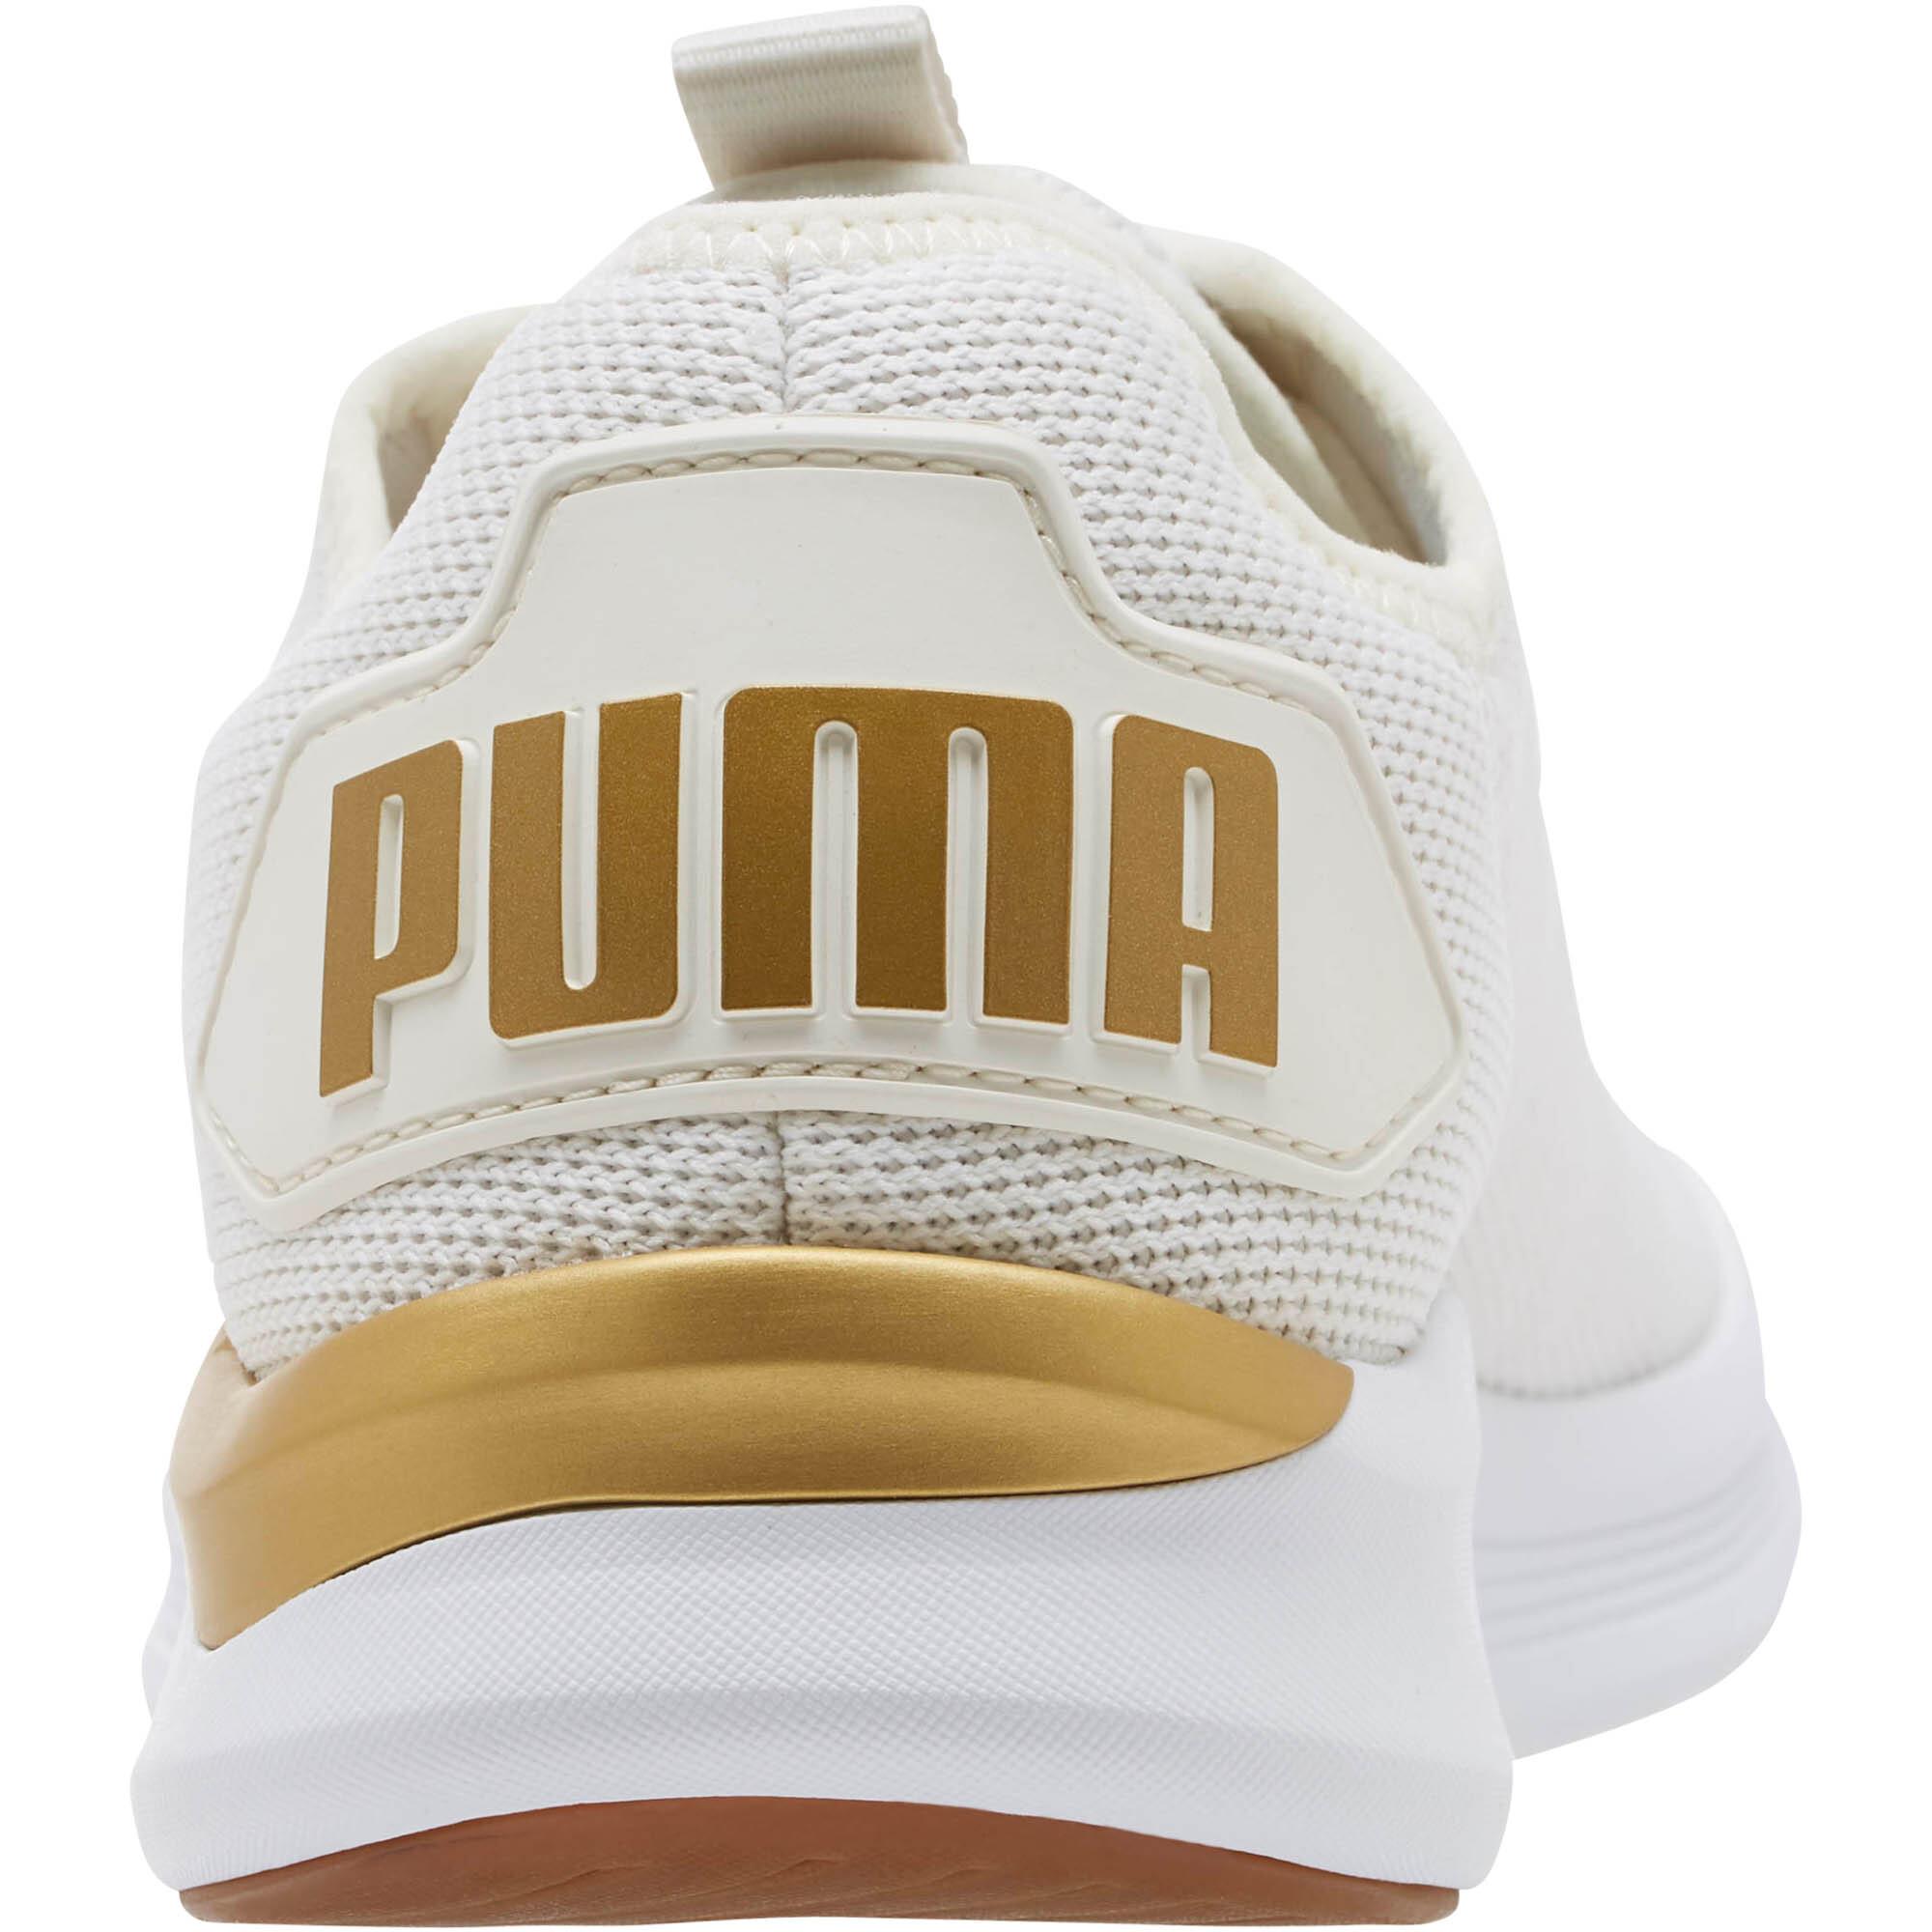 PUMA-Ballast-Women-039-s-Running-Shoes-Women-Shoe-Running thumbnail 13